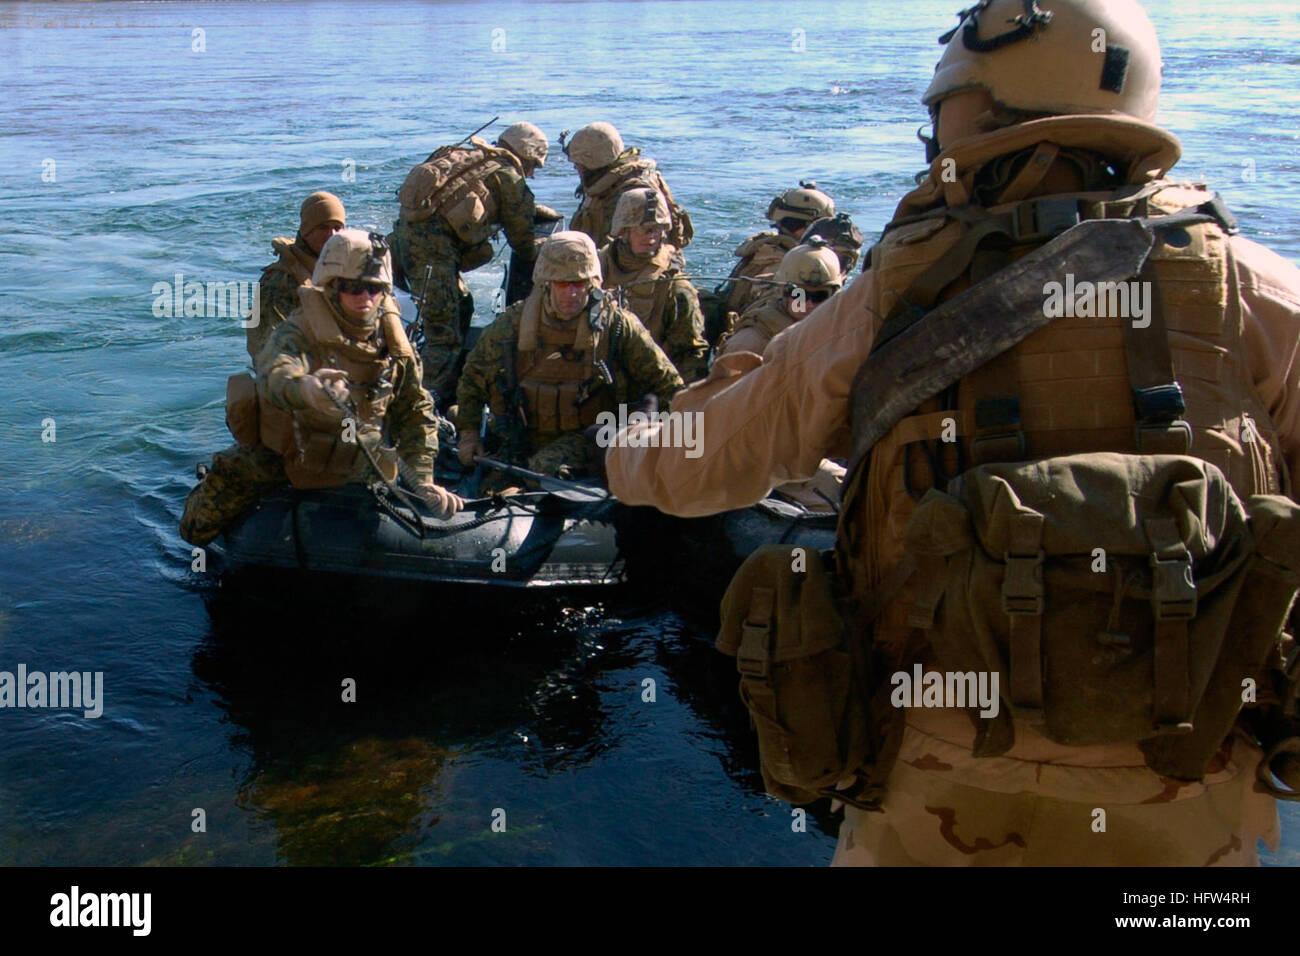 080106-N-8135W-240 HADITHA, Iraq (Jan. 6, 2007) Sailors attached to Riverine Squadron (RIVRON) 2 Detachment 3 come - Stock Image